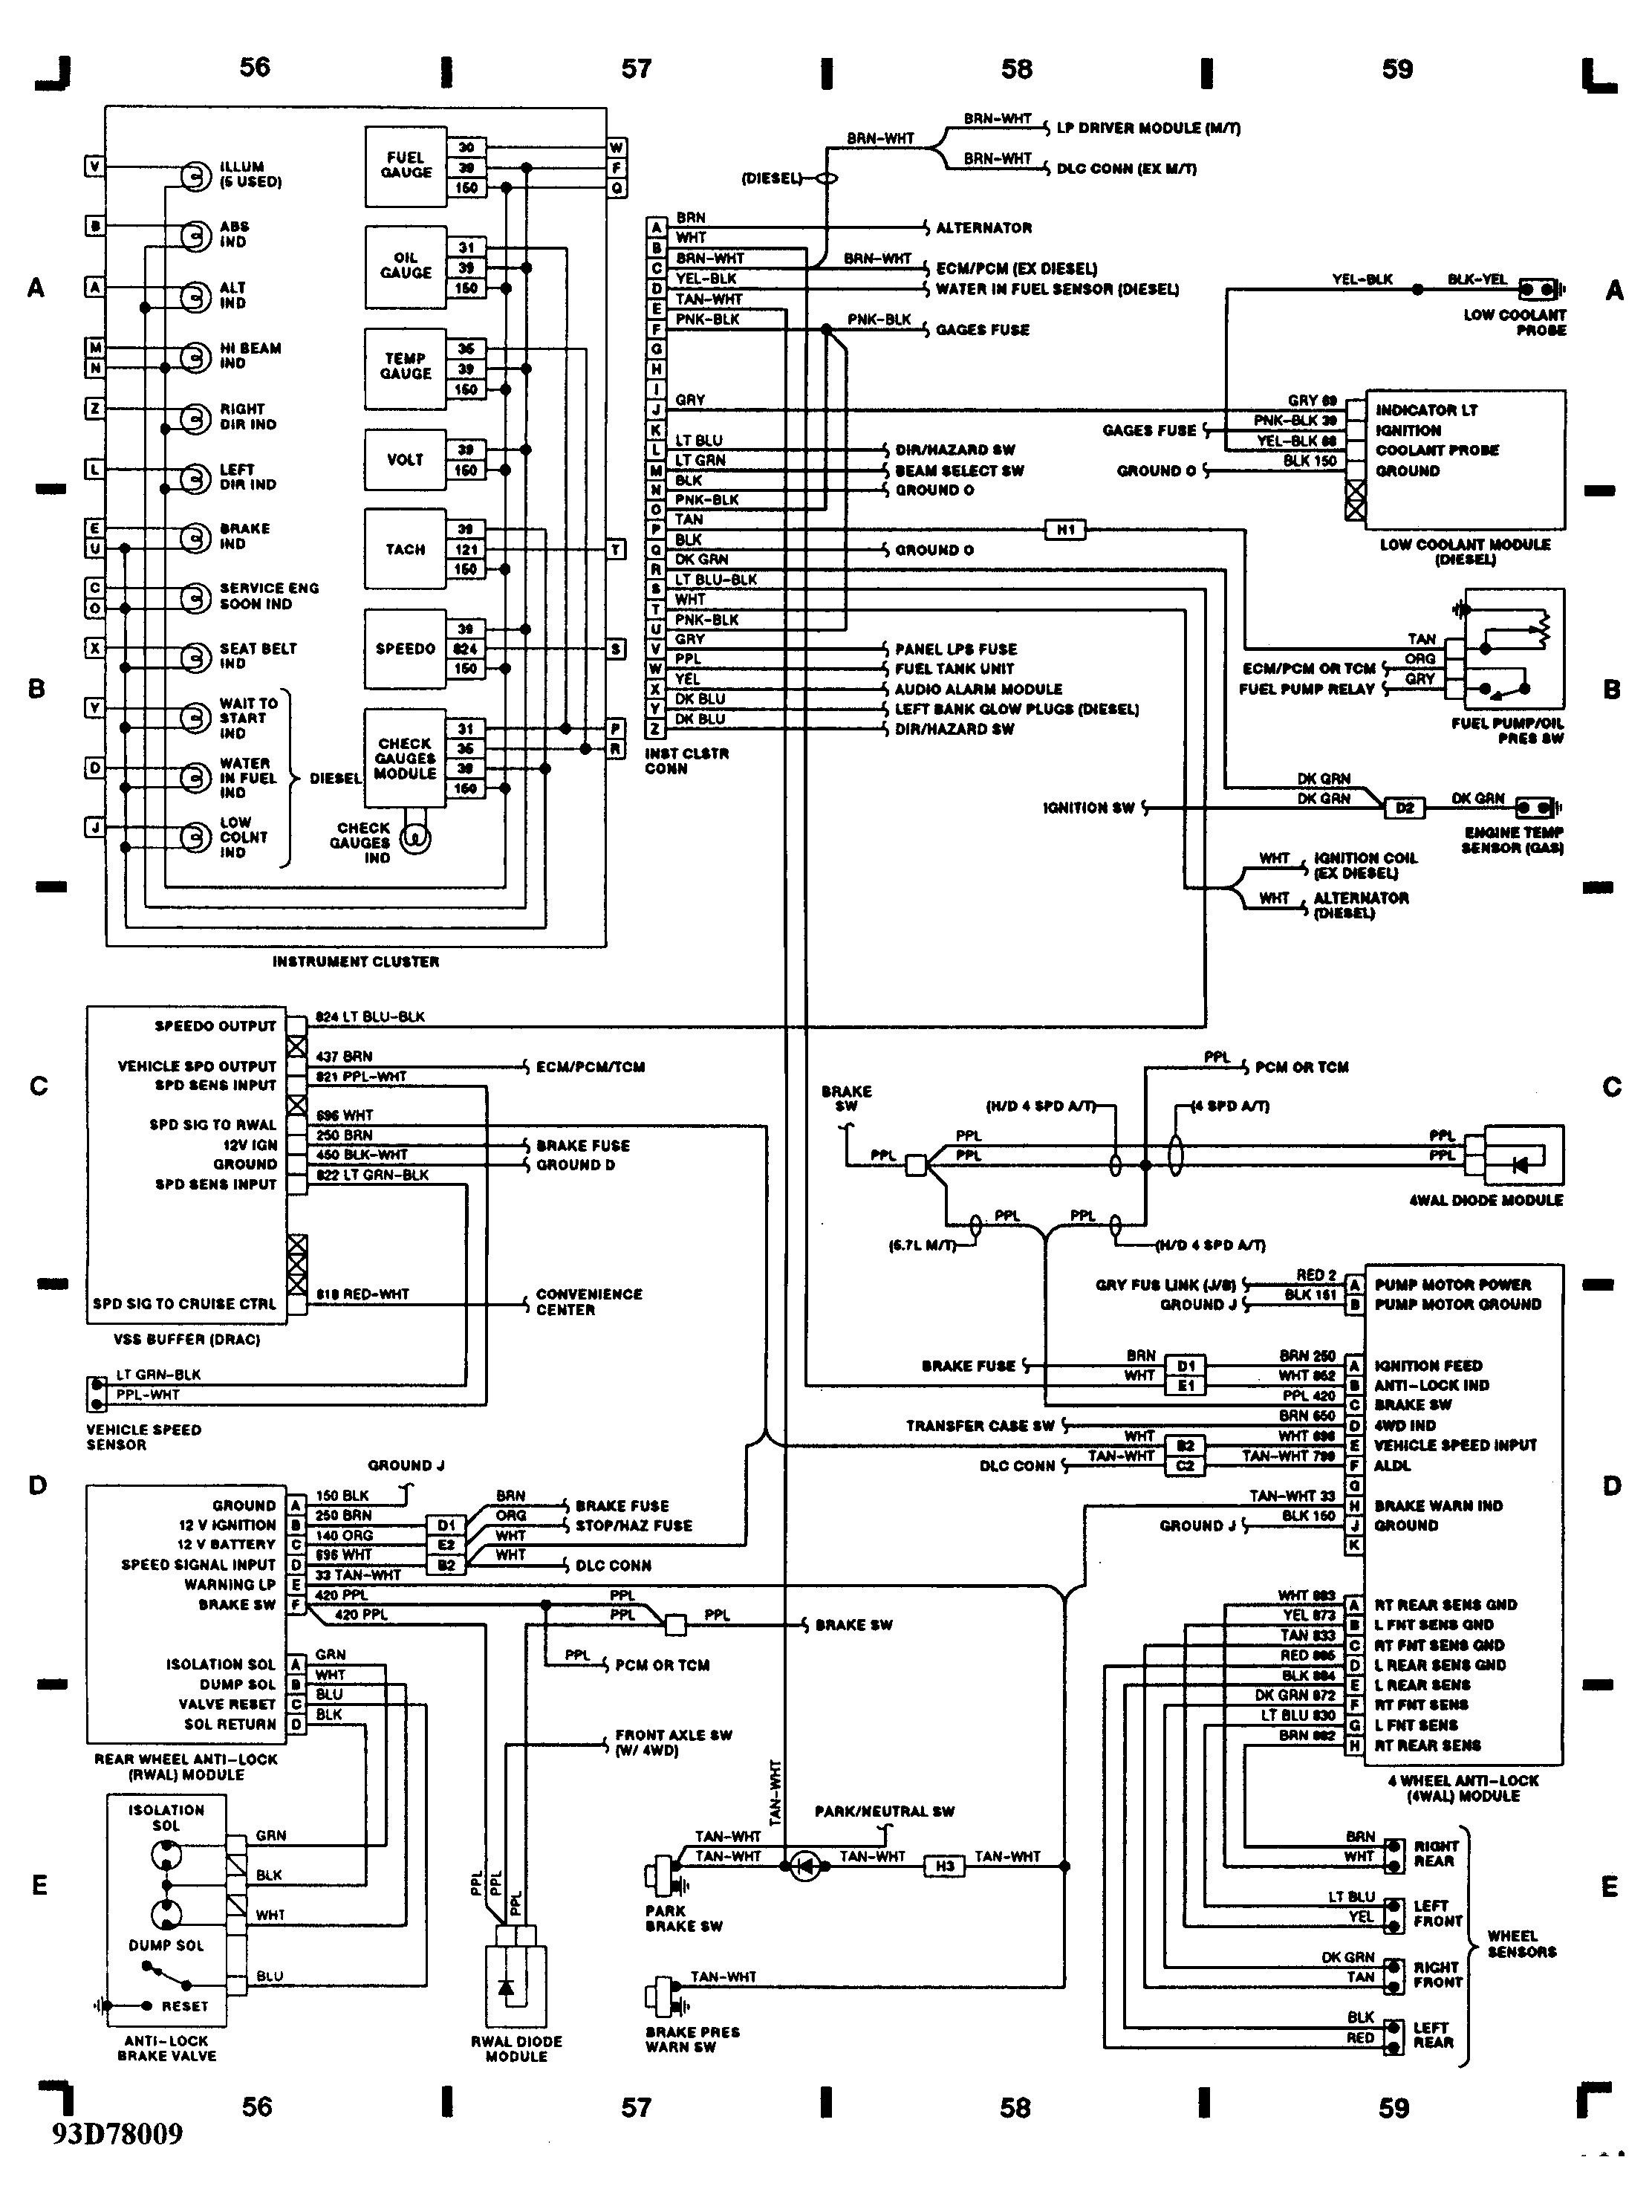 5 3 vortec engine diagram awesome 5 7 vortec wiring harness diagram rh detoxicrecenze com GM Wiring Harness GM Wiring Harness